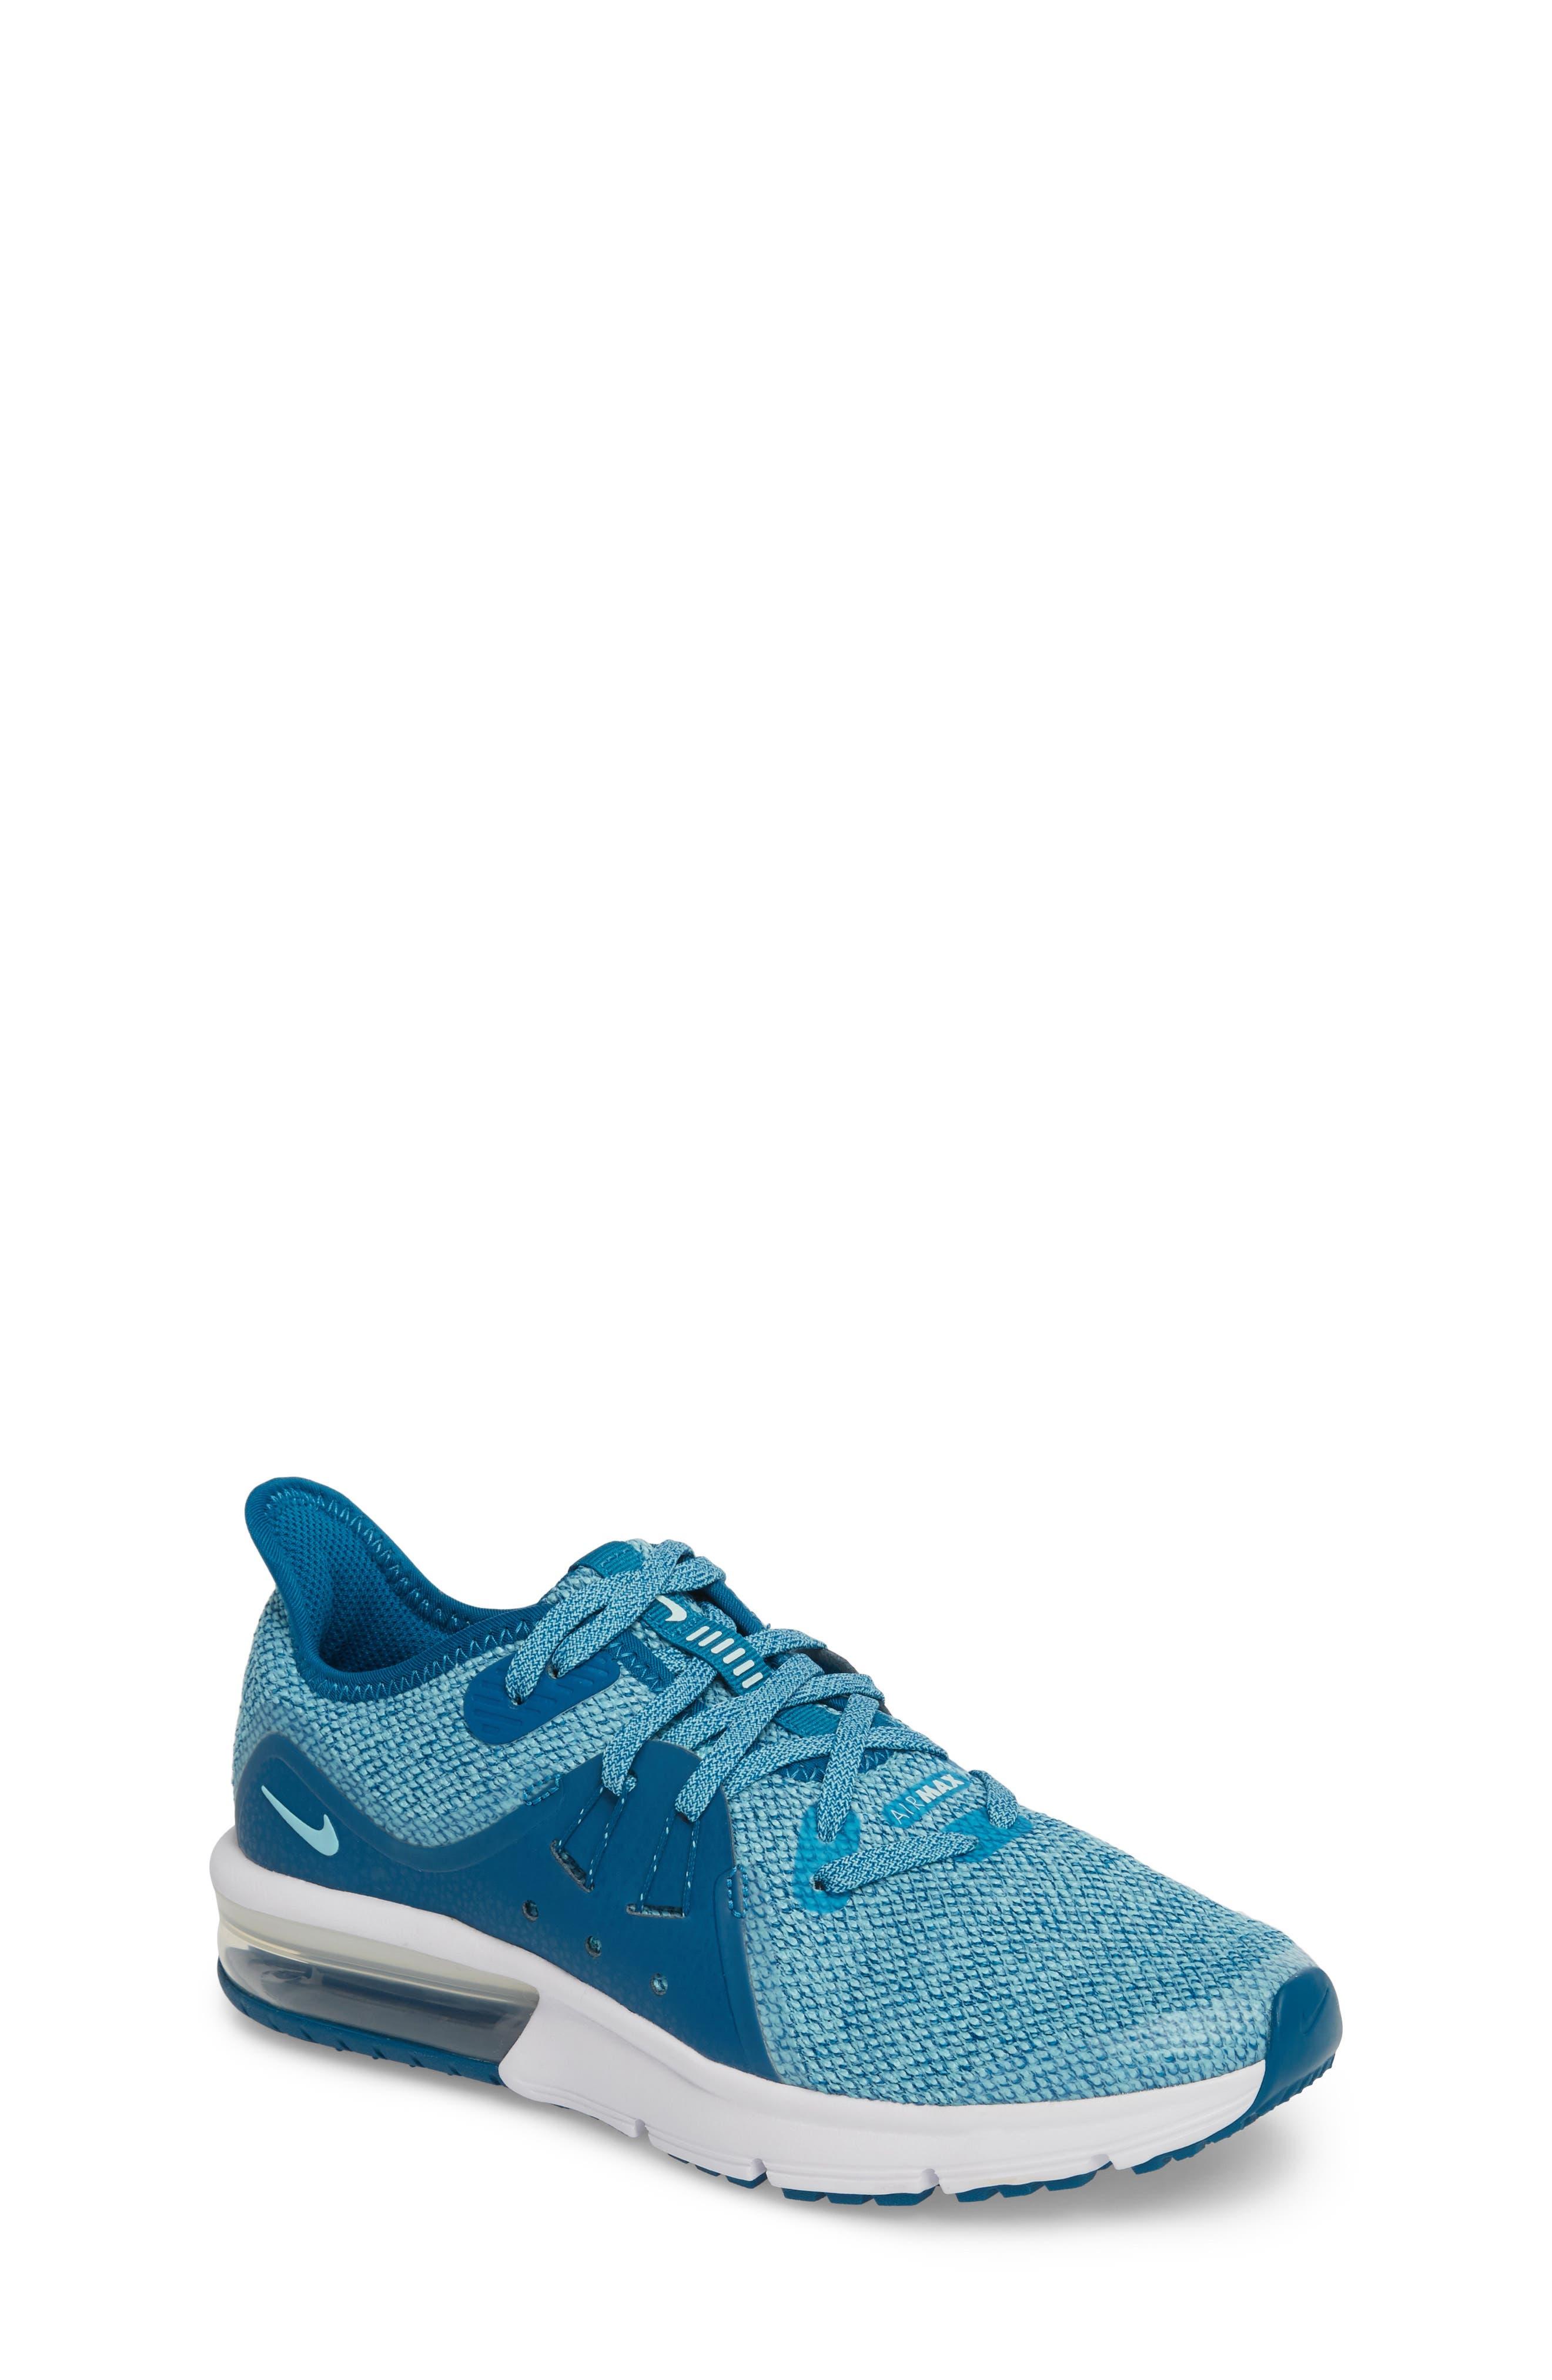 Air Max Sequent 3 GS Running Shoe,                             Main thumbnail 1, color,                             Green/ Igloo/ Bleached Aqua